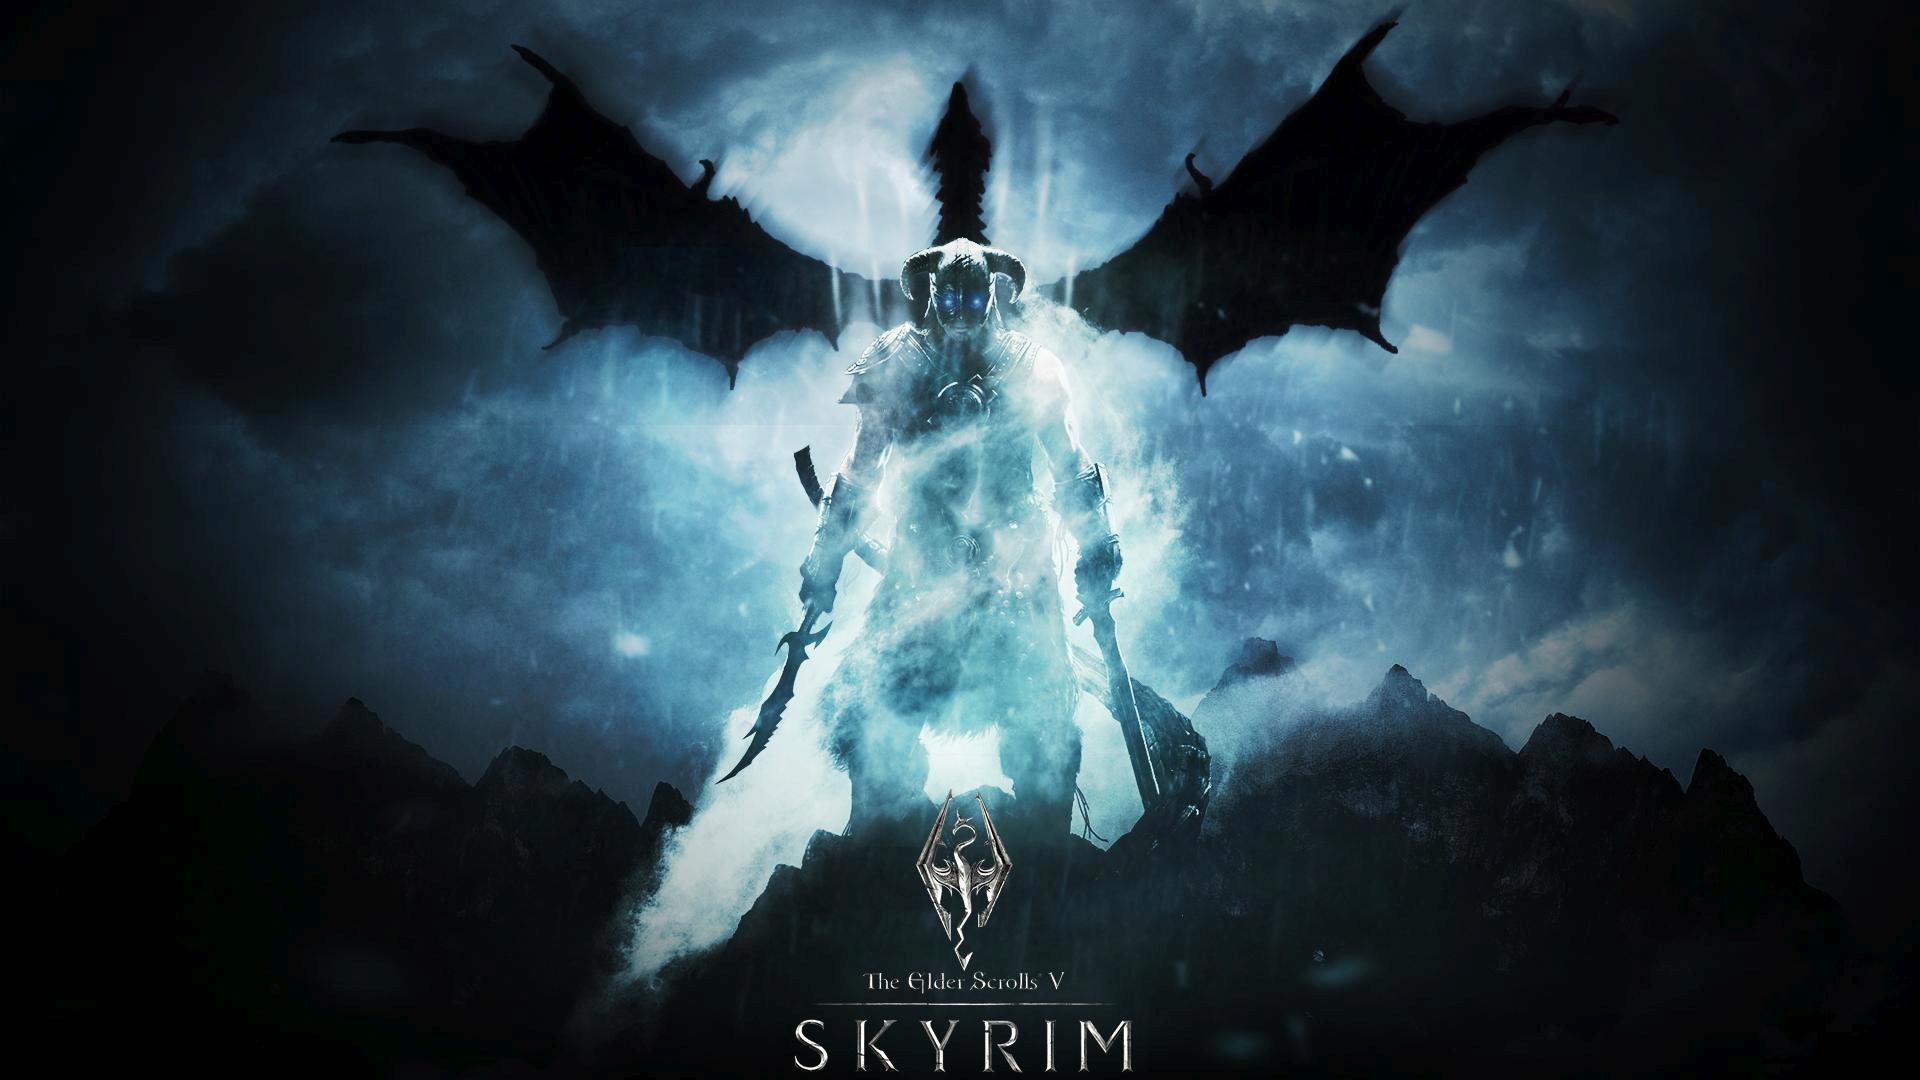 Skyrim desktop background